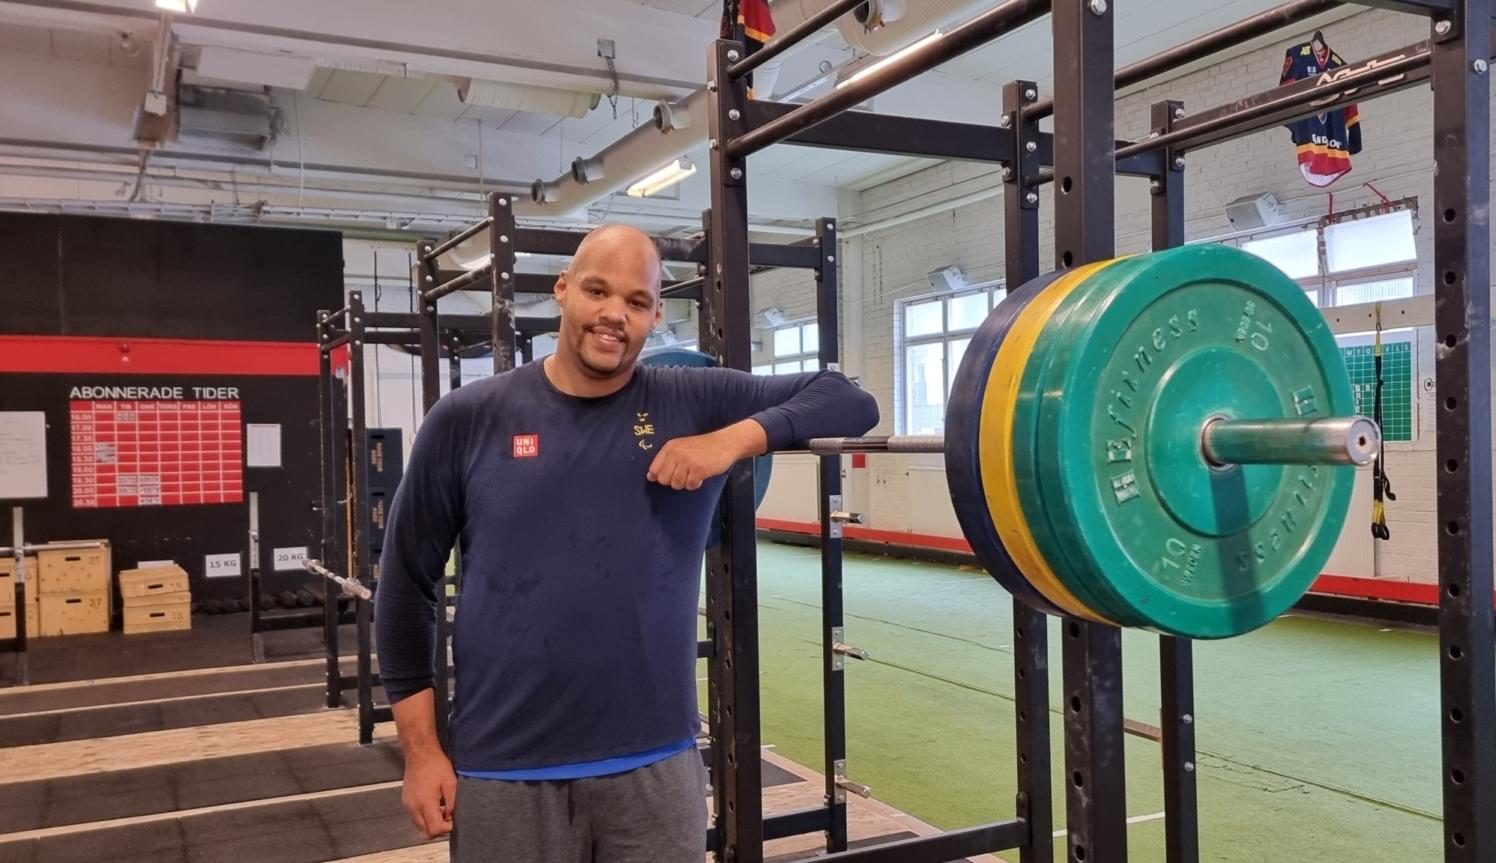 en leende man i ettt gym lutar sig mot en skivstång